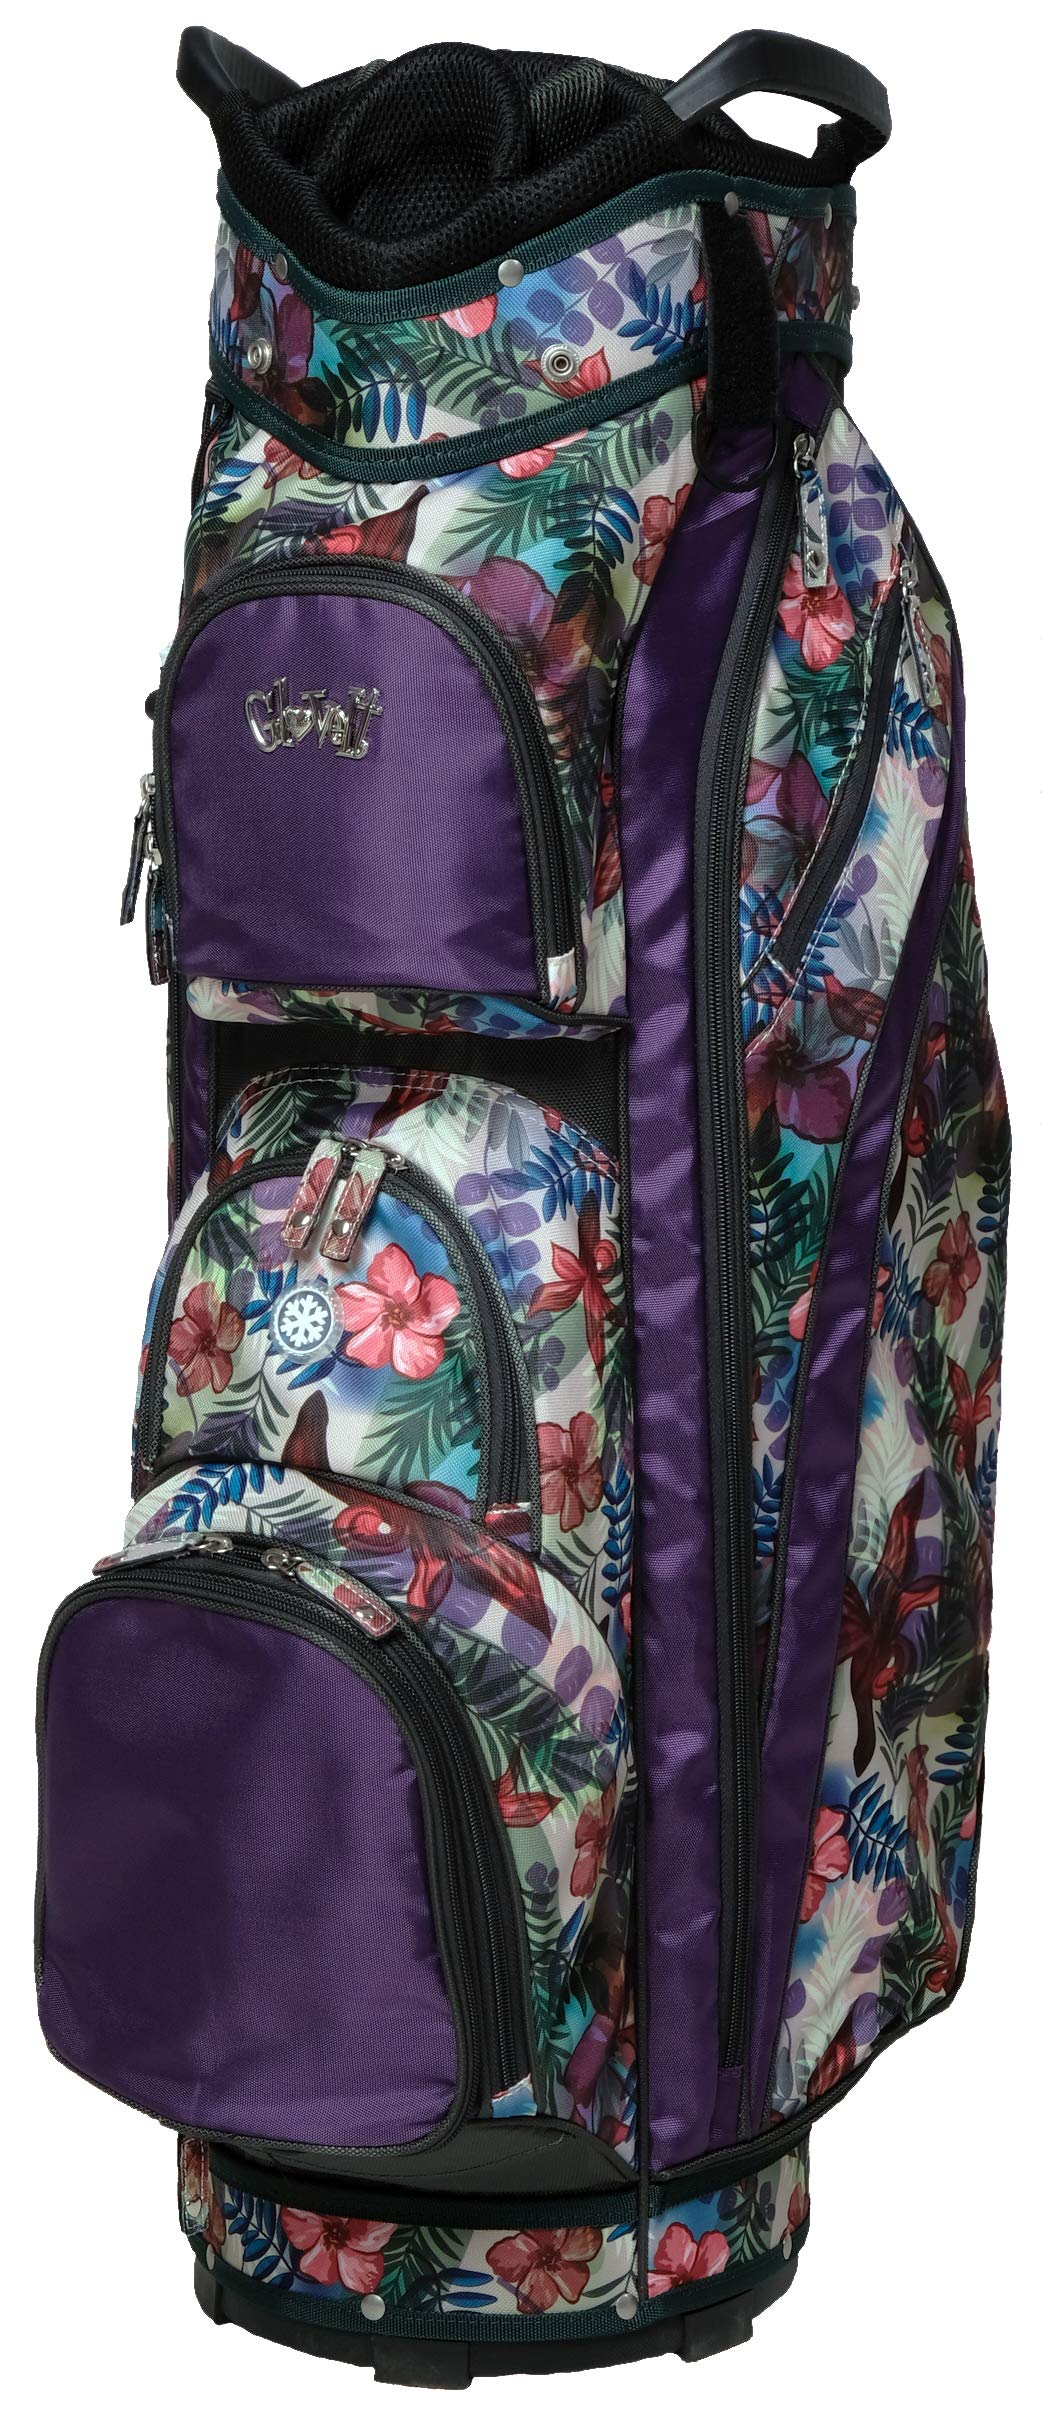 Glove It Women's Golf Bag Ladies 14 Way Golf Carry Bag - Golf Cart Bags for Women - Womens Lightweight Golf Travel Case - Easy Lift Handle - 2019 Tropical by Glove It